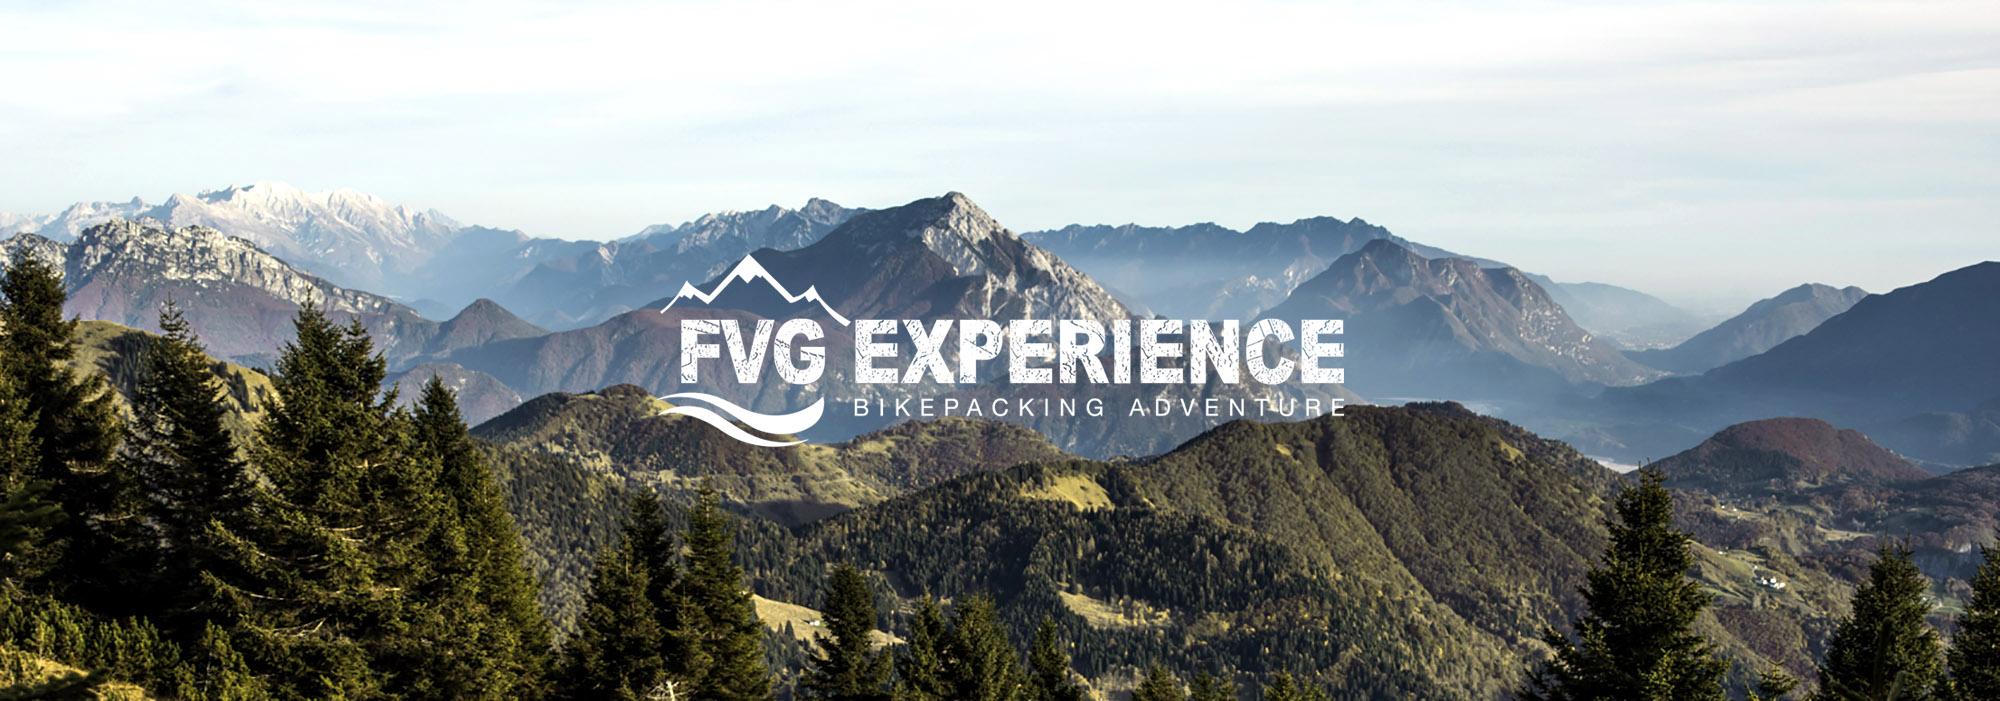 fvg-mtb-bikepacking-carnia-montagna